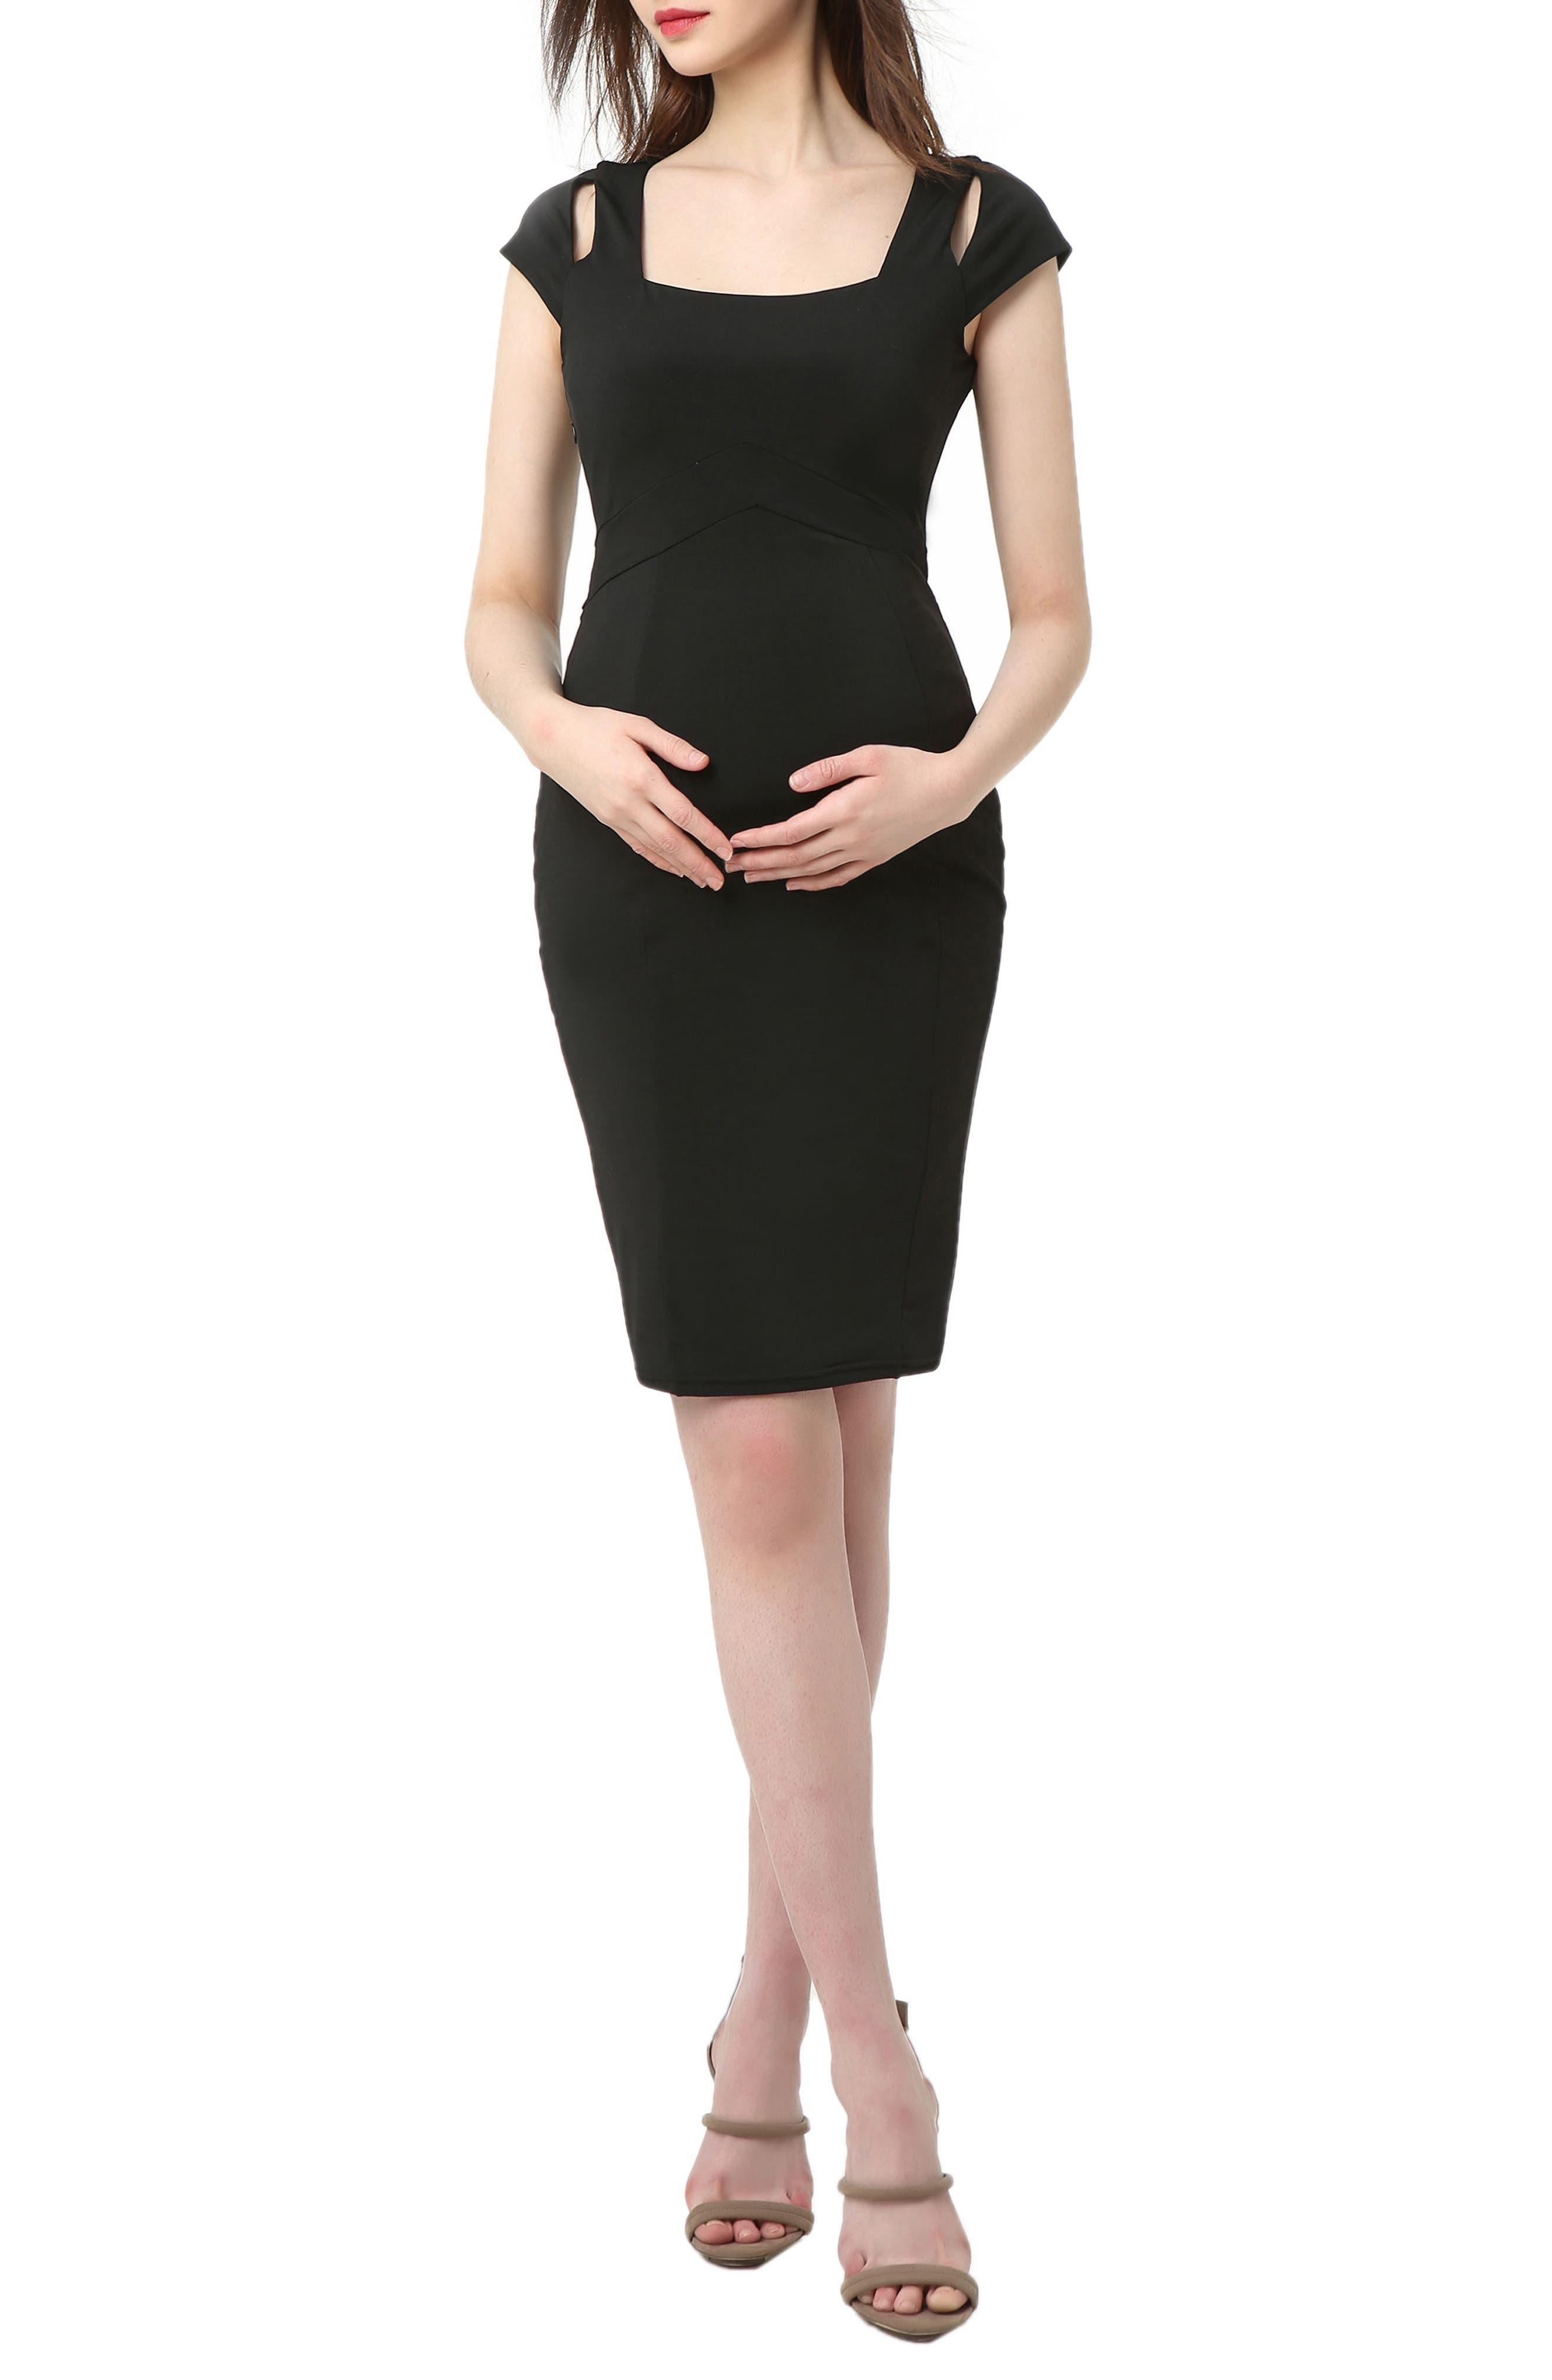 Kimi And Kai Julie Cold Shoulder Body-Con Maternity Dress, Black